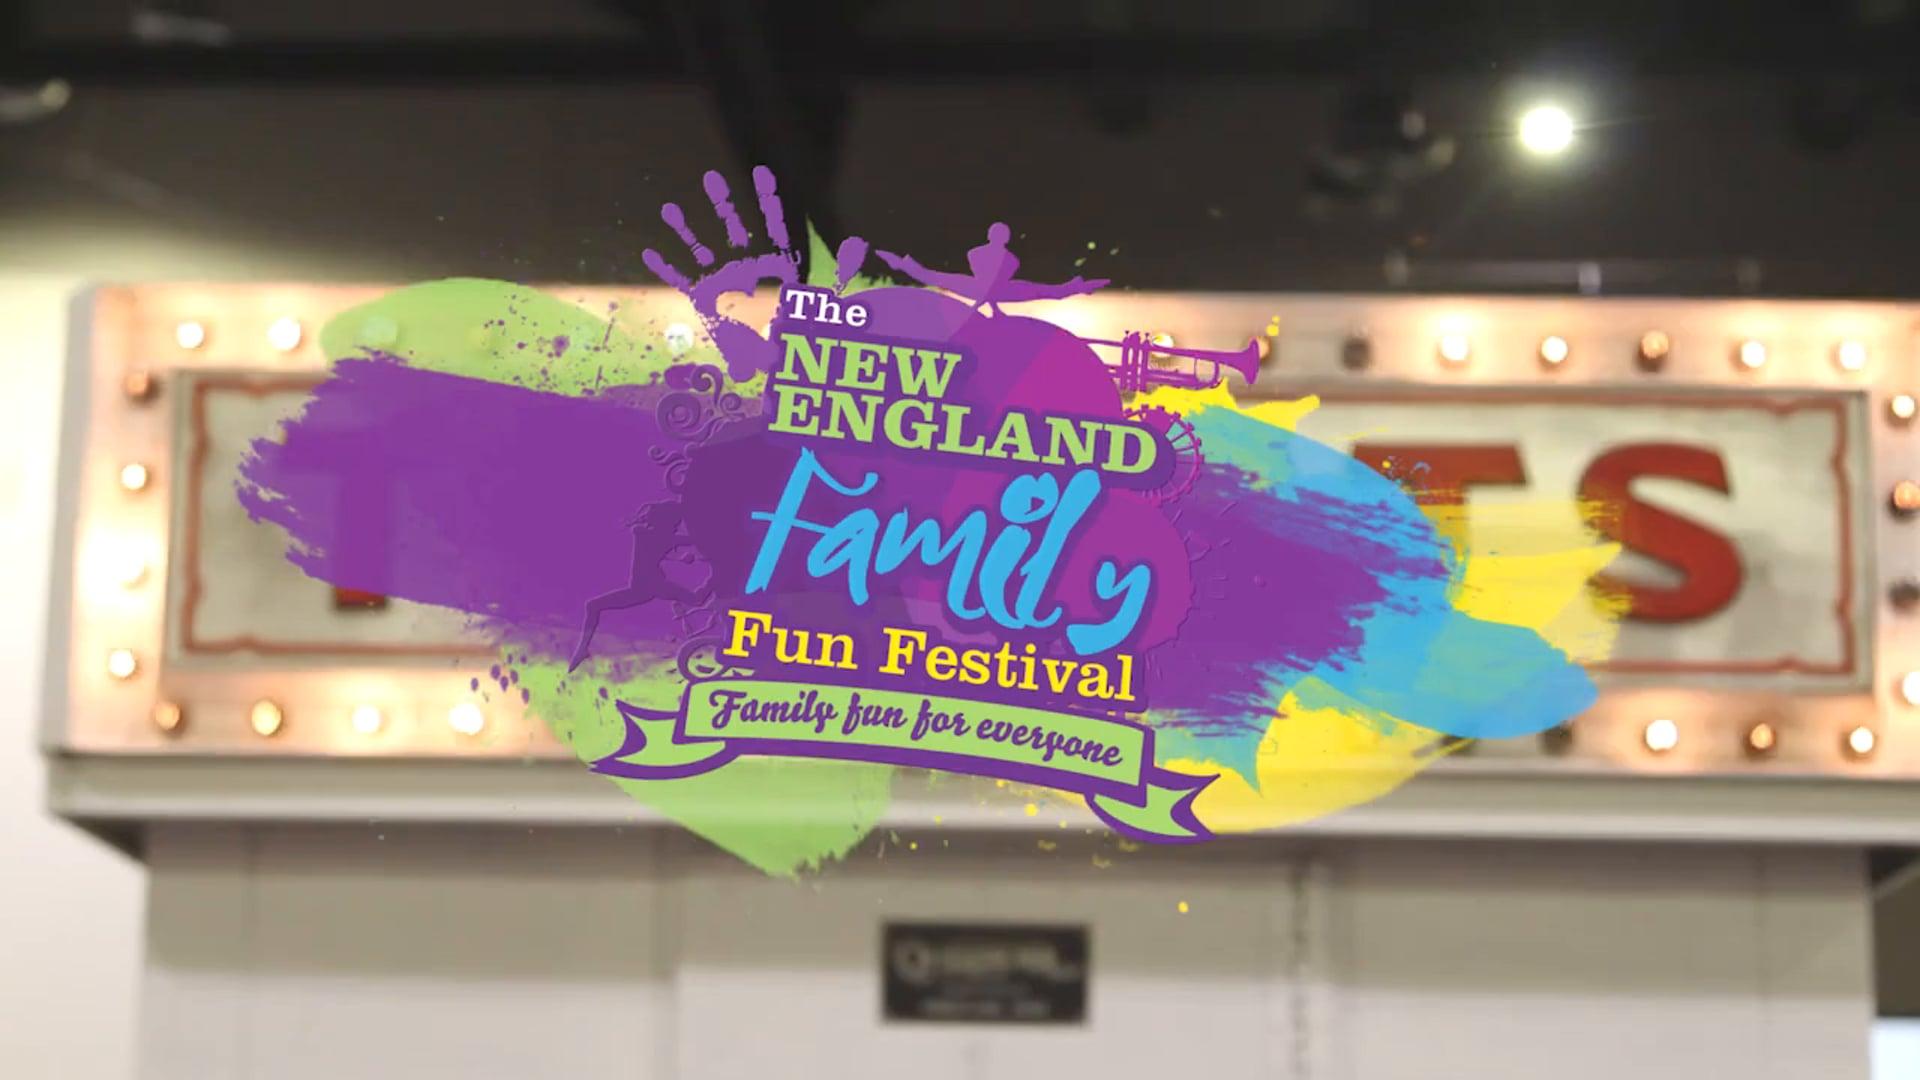 The New England Family Fun Festival - 2014  --  New+England+Family+Fun+Festival-+Family+Fun+For+Everyone.-HD